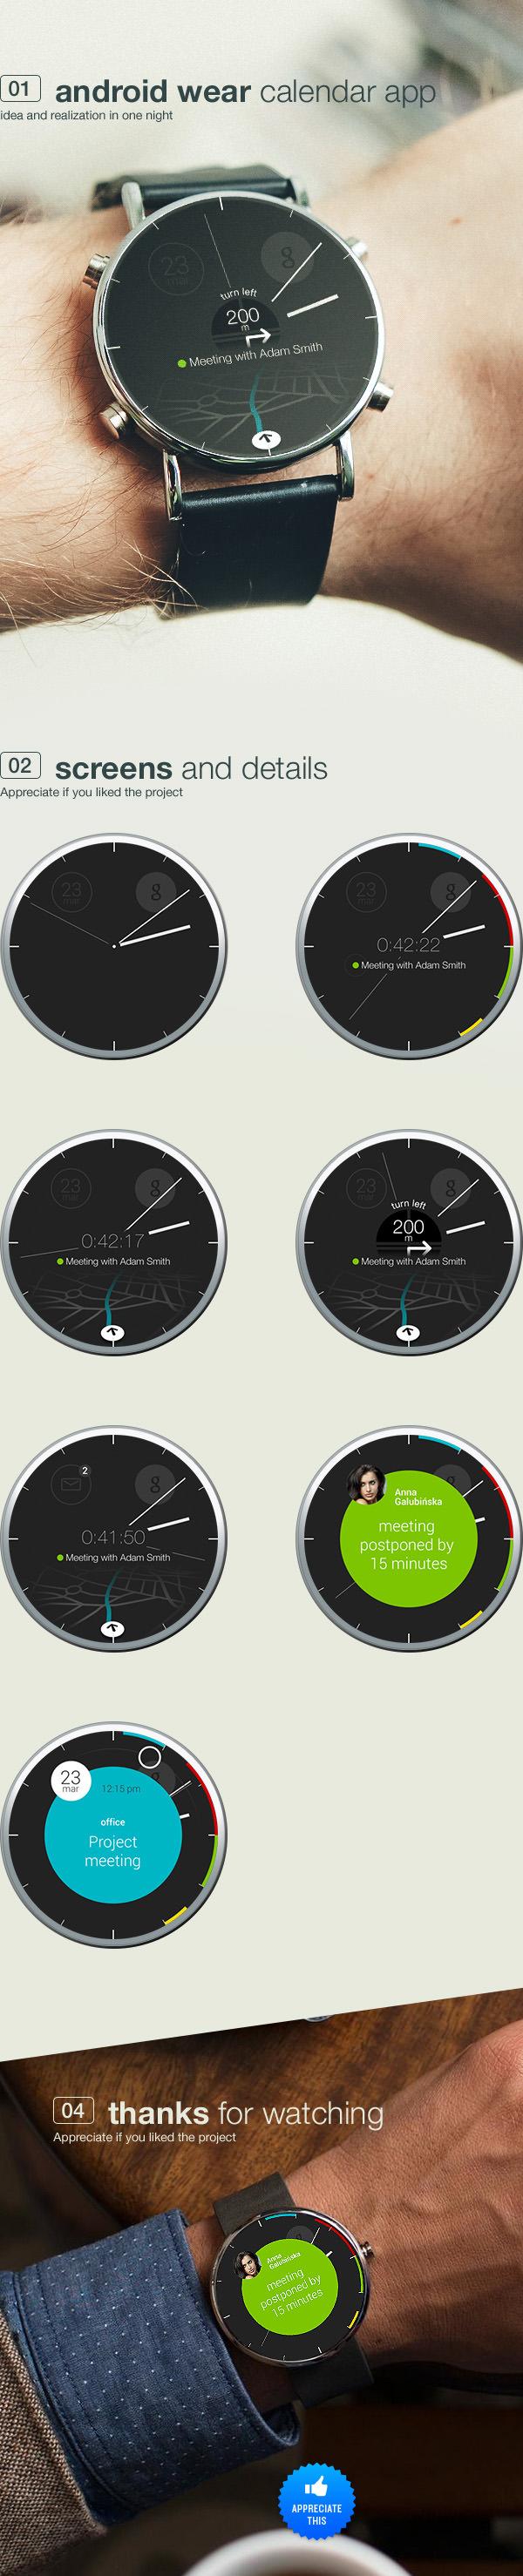 calendar clock android wear app concept